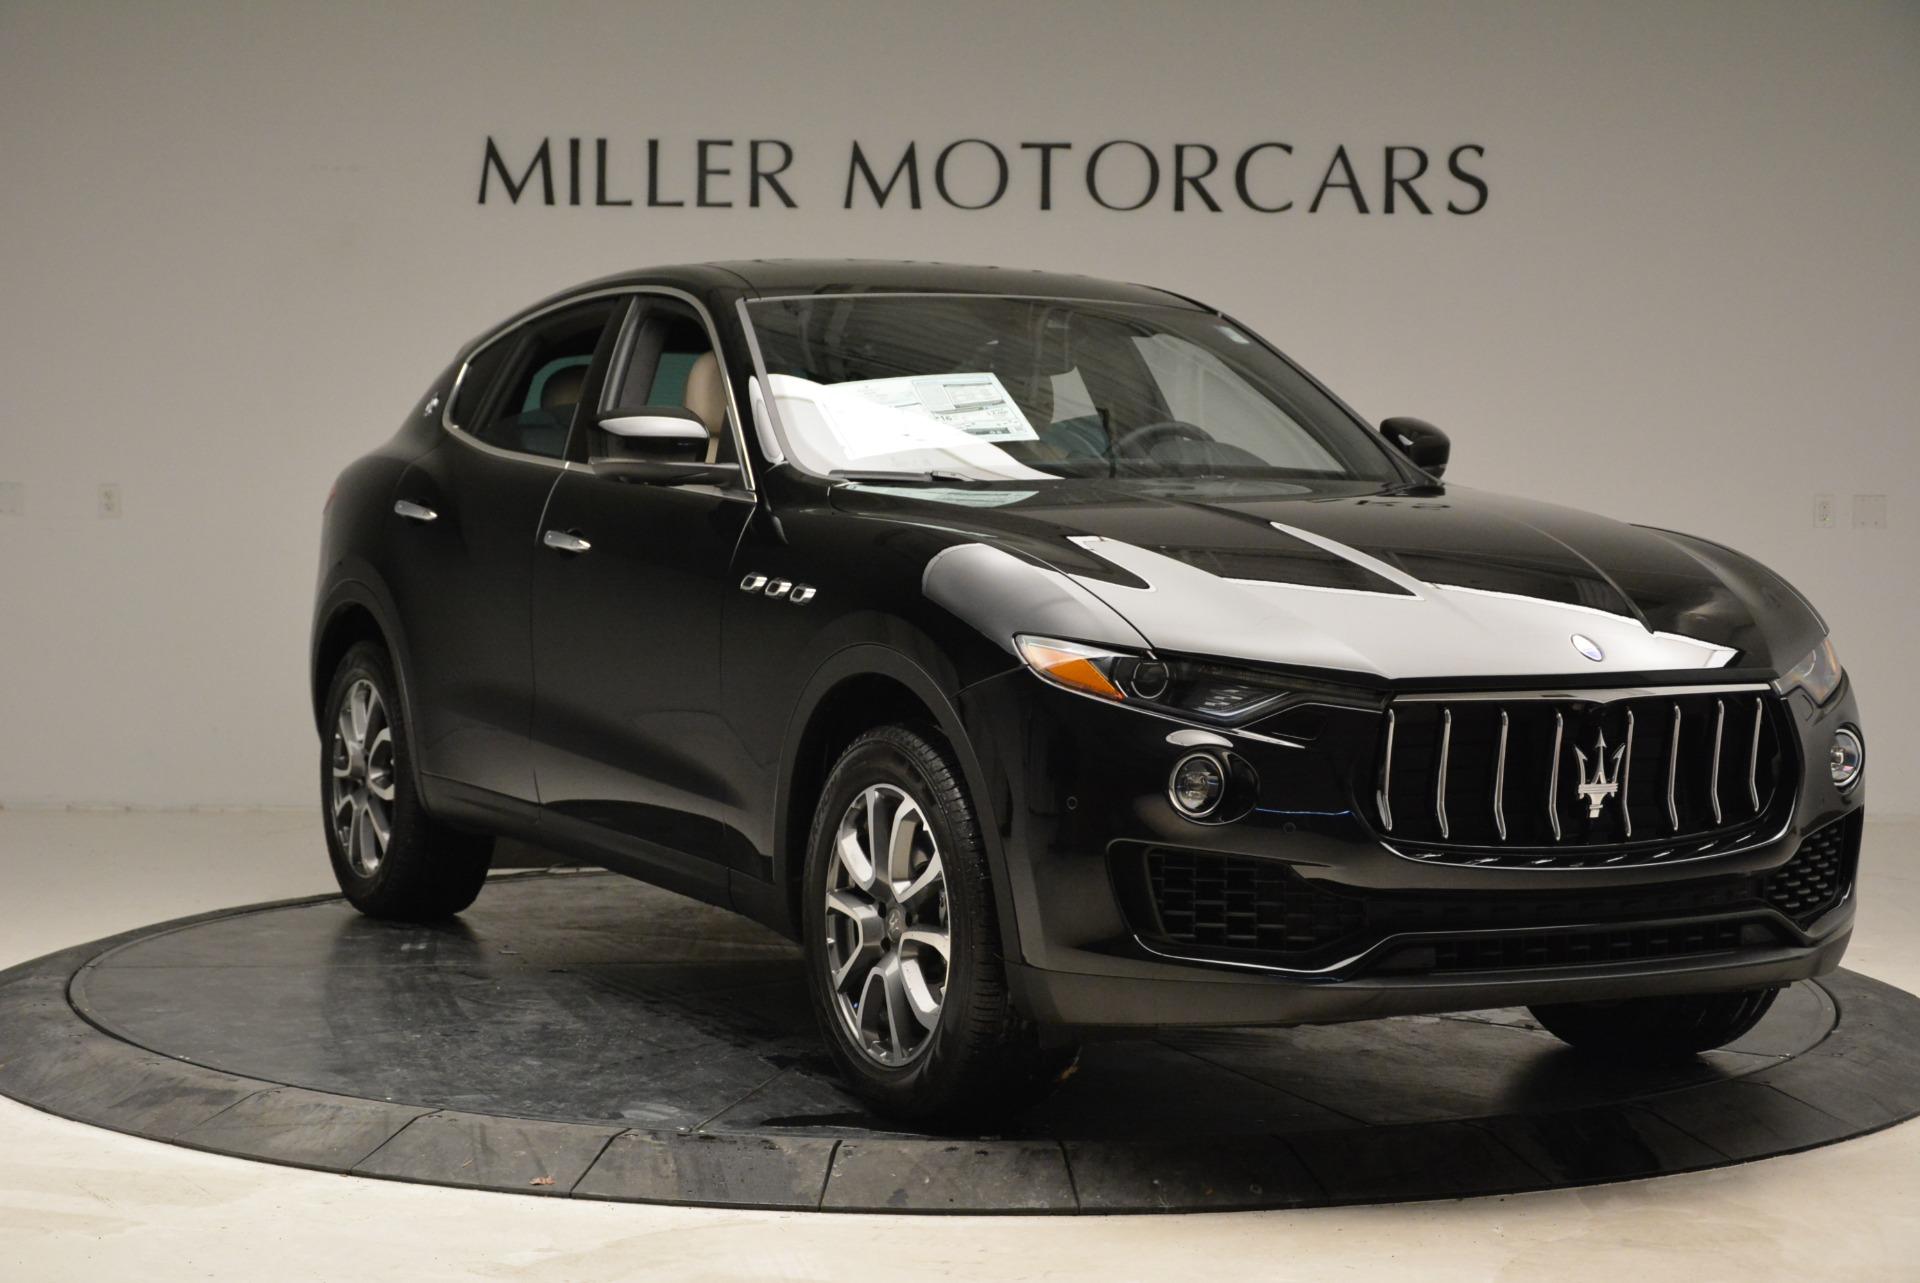 New-2017-Maserati-Levante-Q4